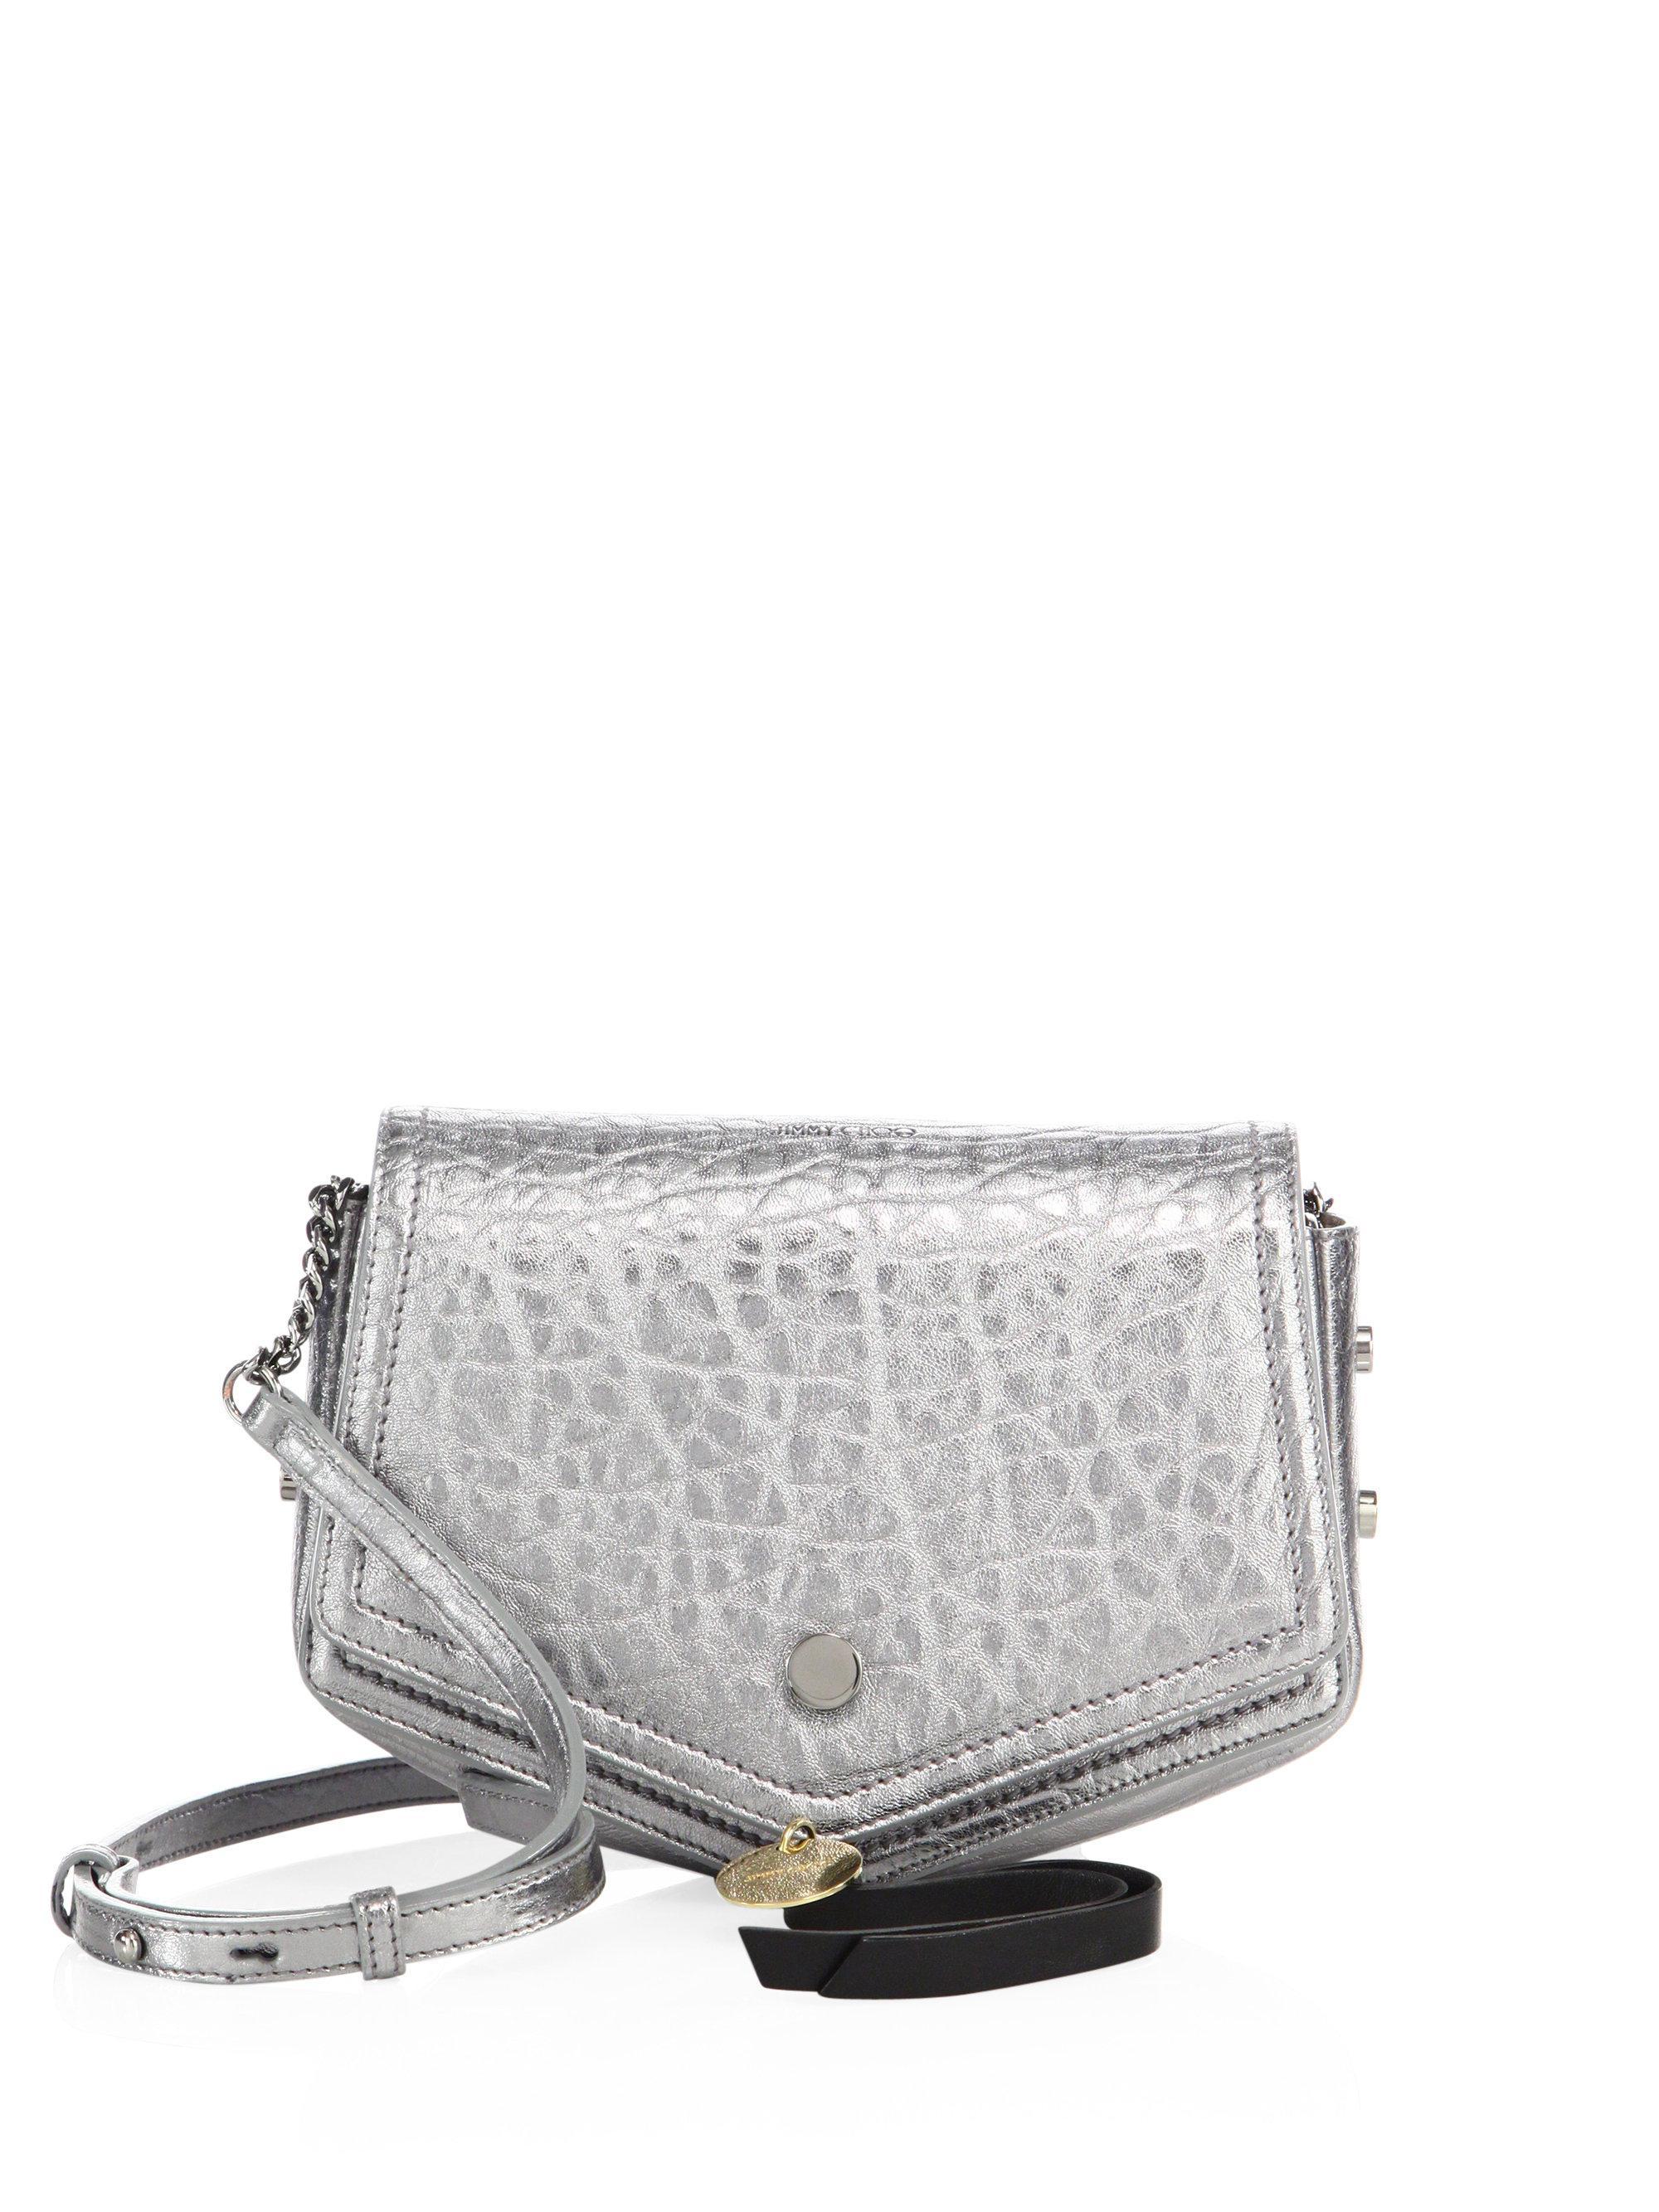 0d34510880577 Lyst - Jimmy Choo Arrow Metallic Leather Cross-body Bag